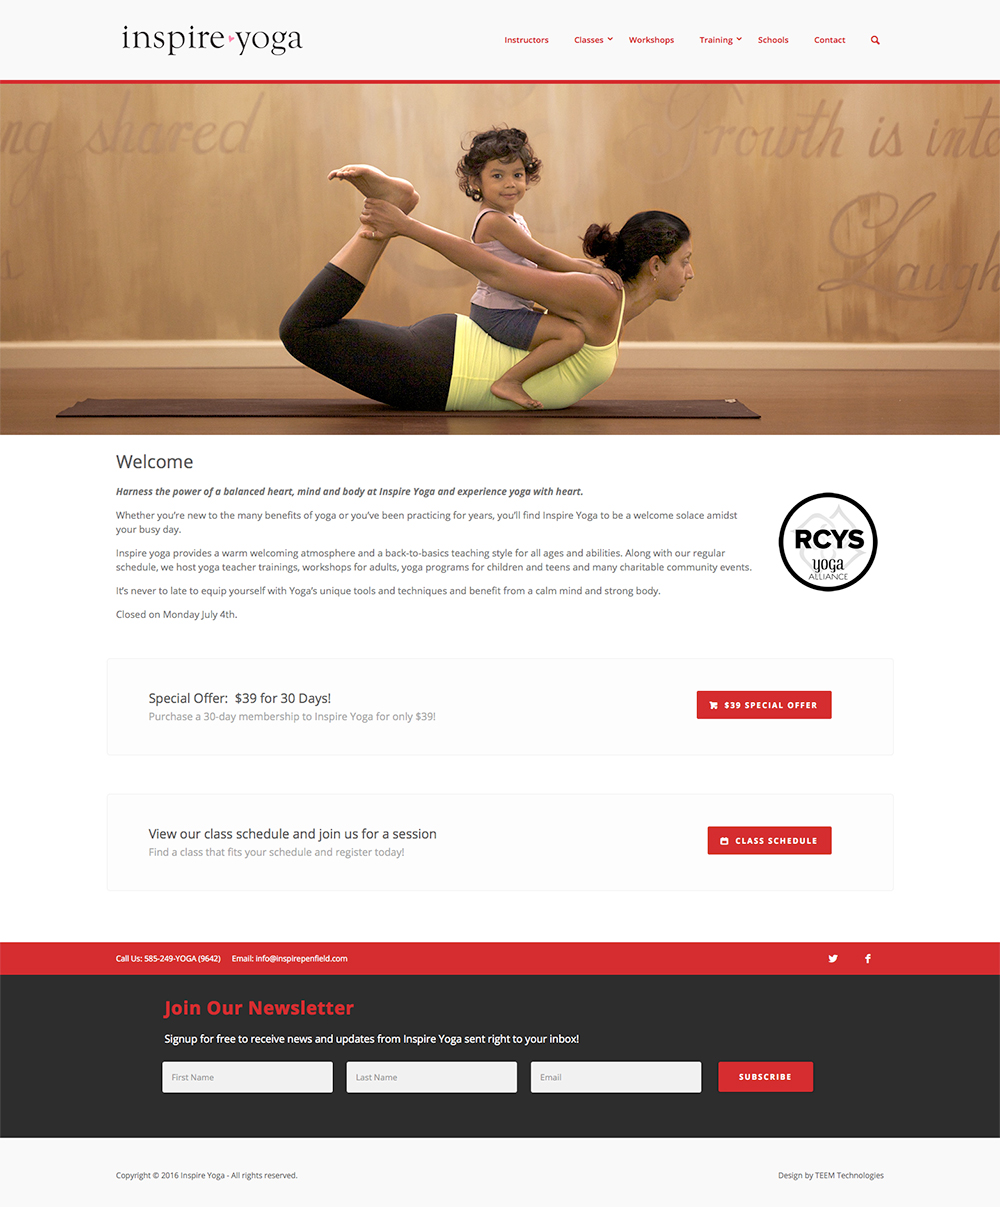 inspireyoga-website-home